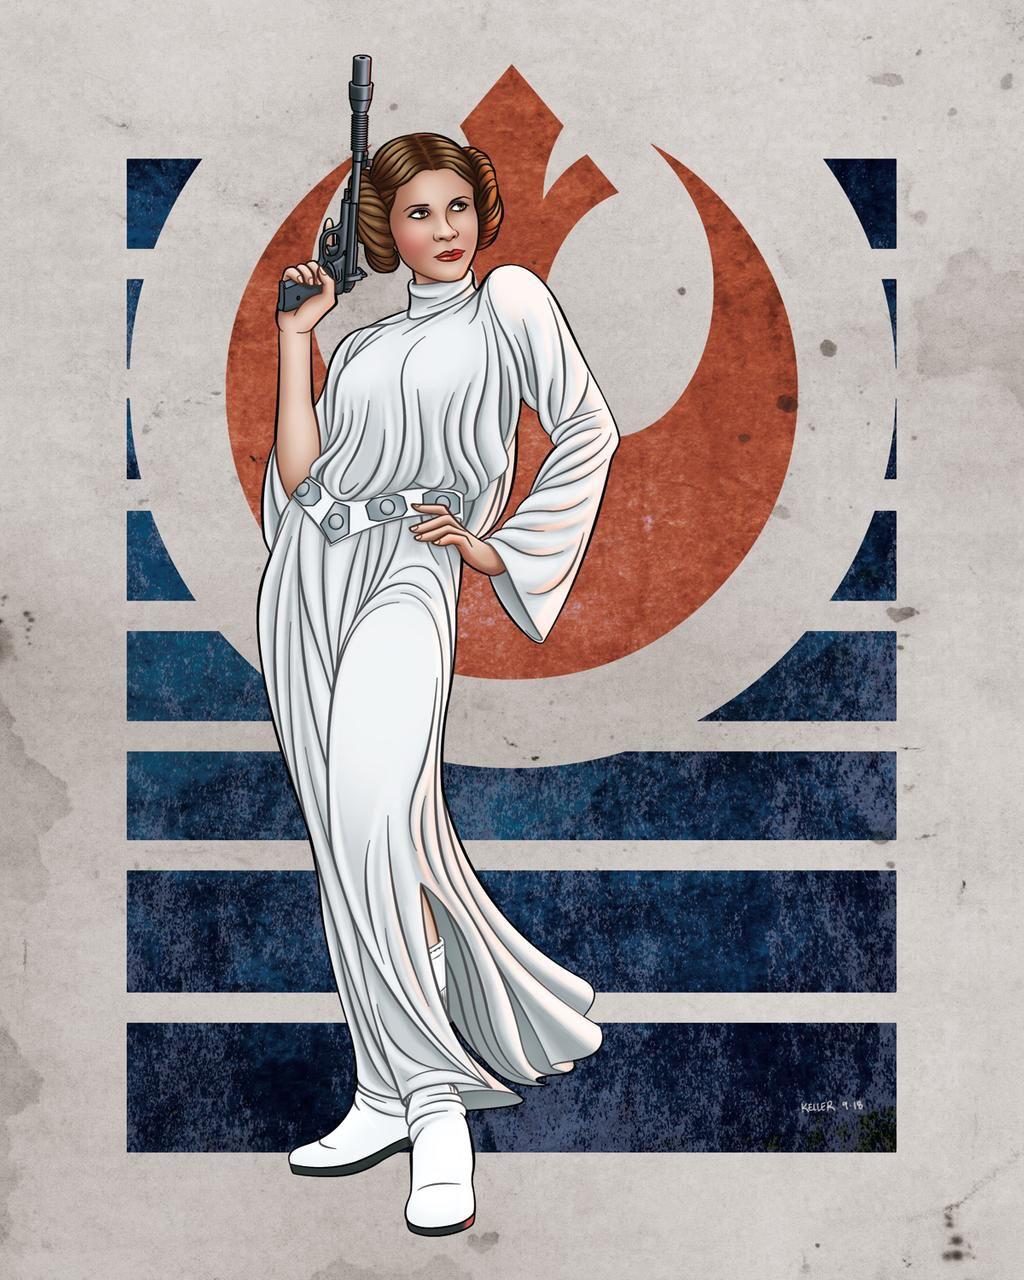 Rebel Princess Princess Leia Gift Princess Leia Art Print Leia Fan Art Vertical Print Set Princess Leia Art Princess Leia Wall Art